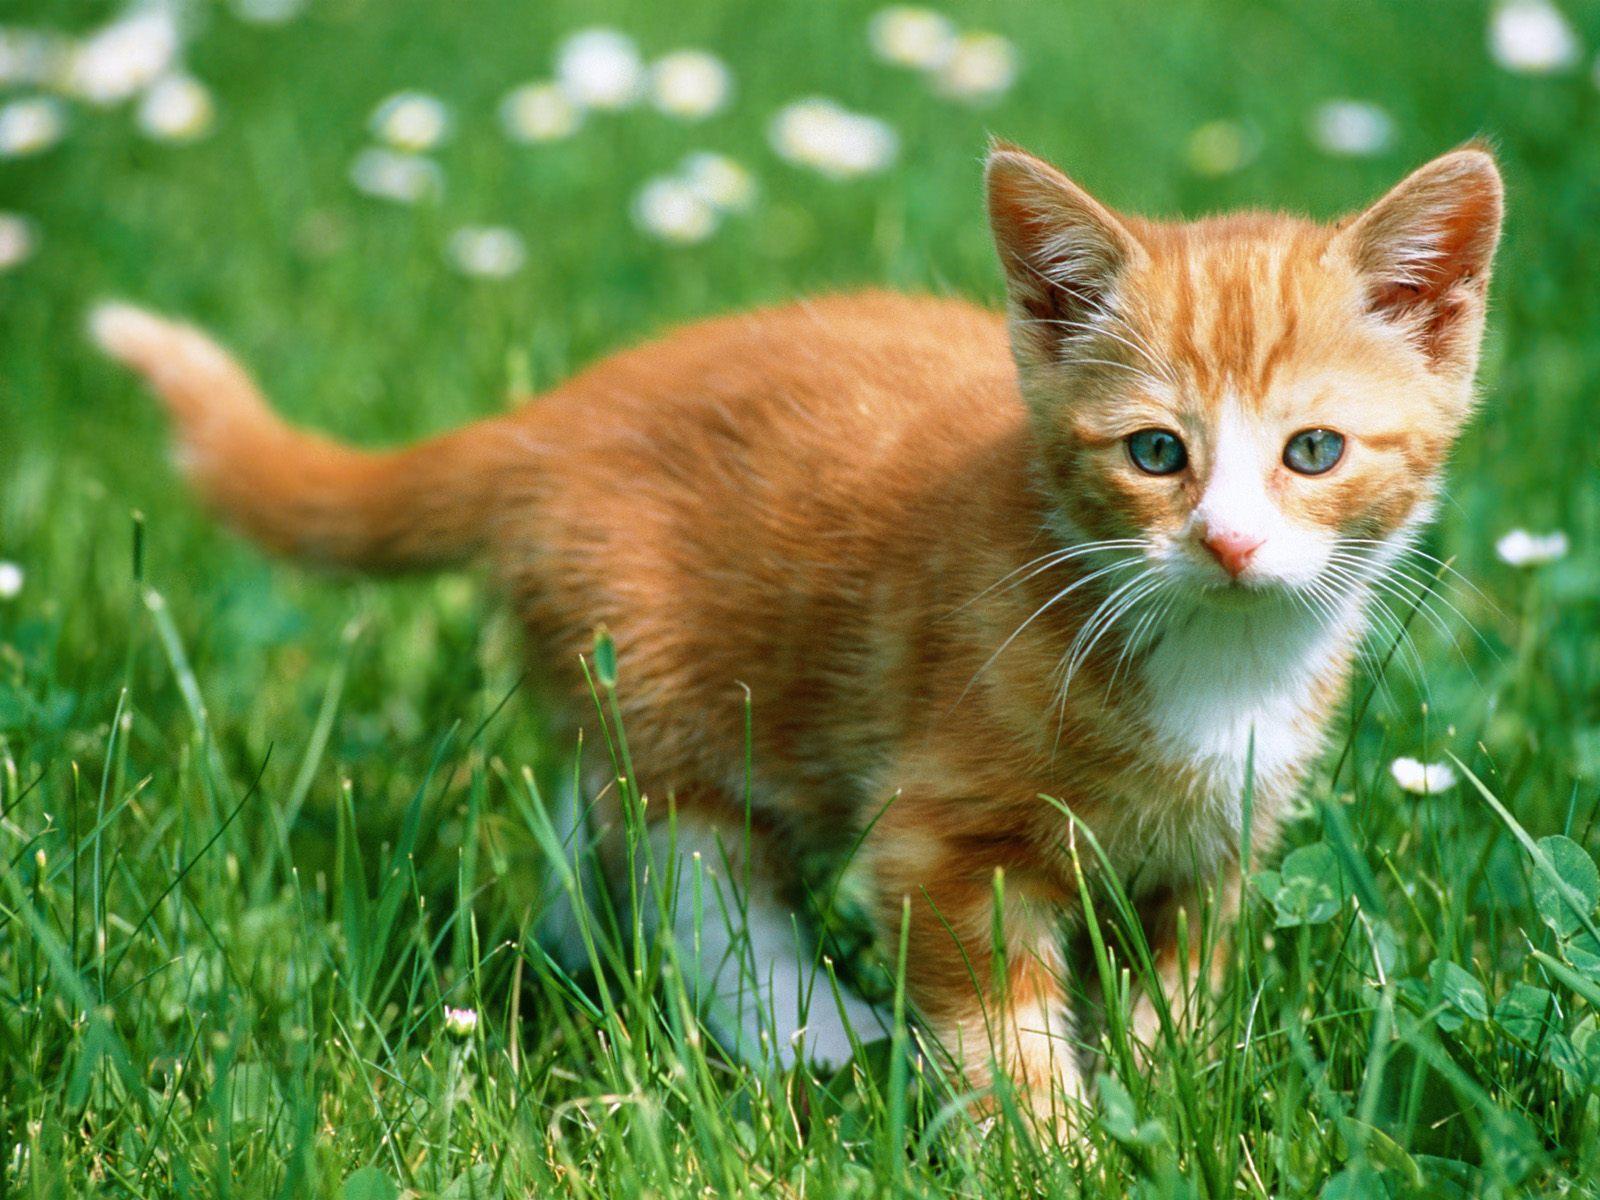 Kitten wallpapers - Kitten wallpaper ...